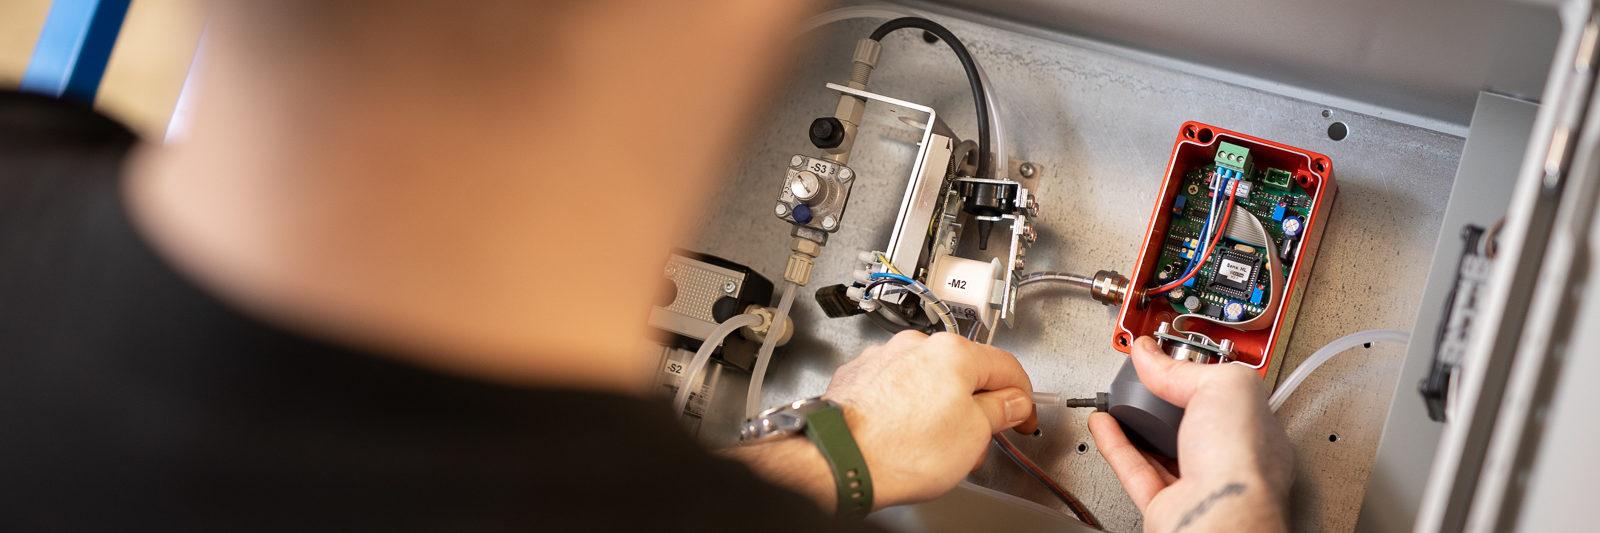 Gaslarm Gasvarnare Gasdetektor Gasmätare